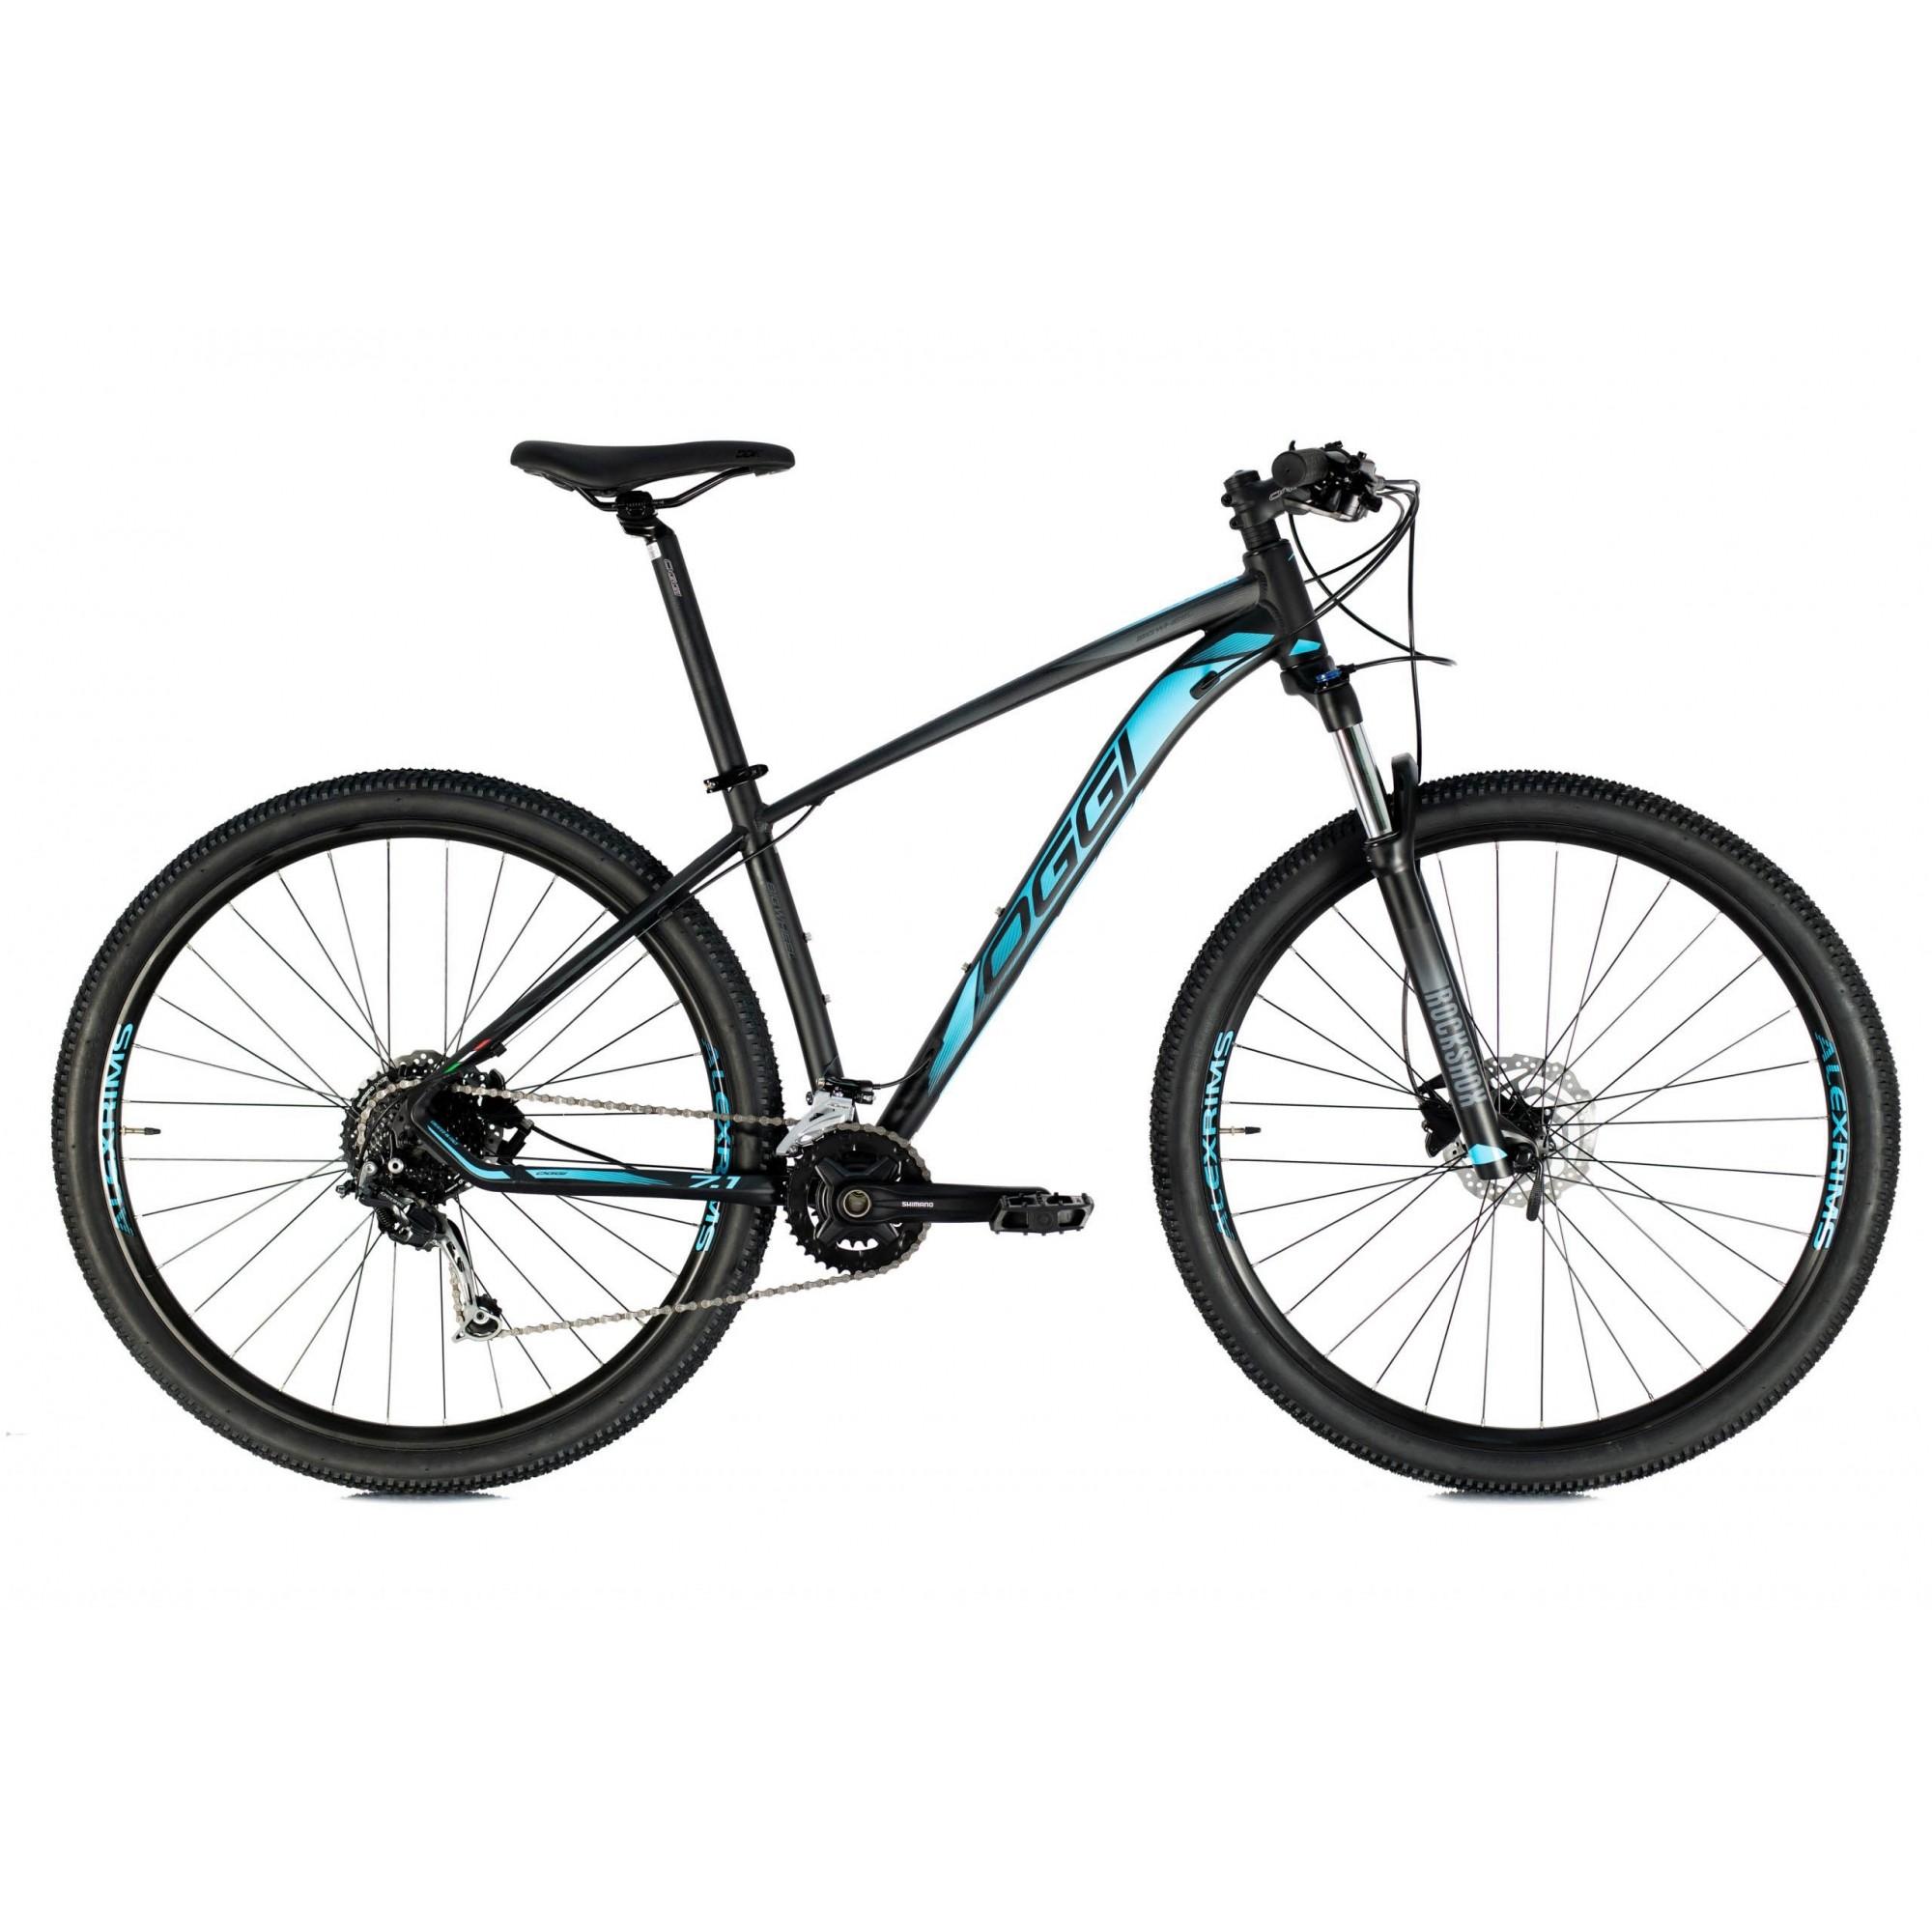 Bicicleta OGGI 7.1 2021 - 18v Shimano Alívio/Deore - Freio Hidráulico Shimano - Preto/Azul